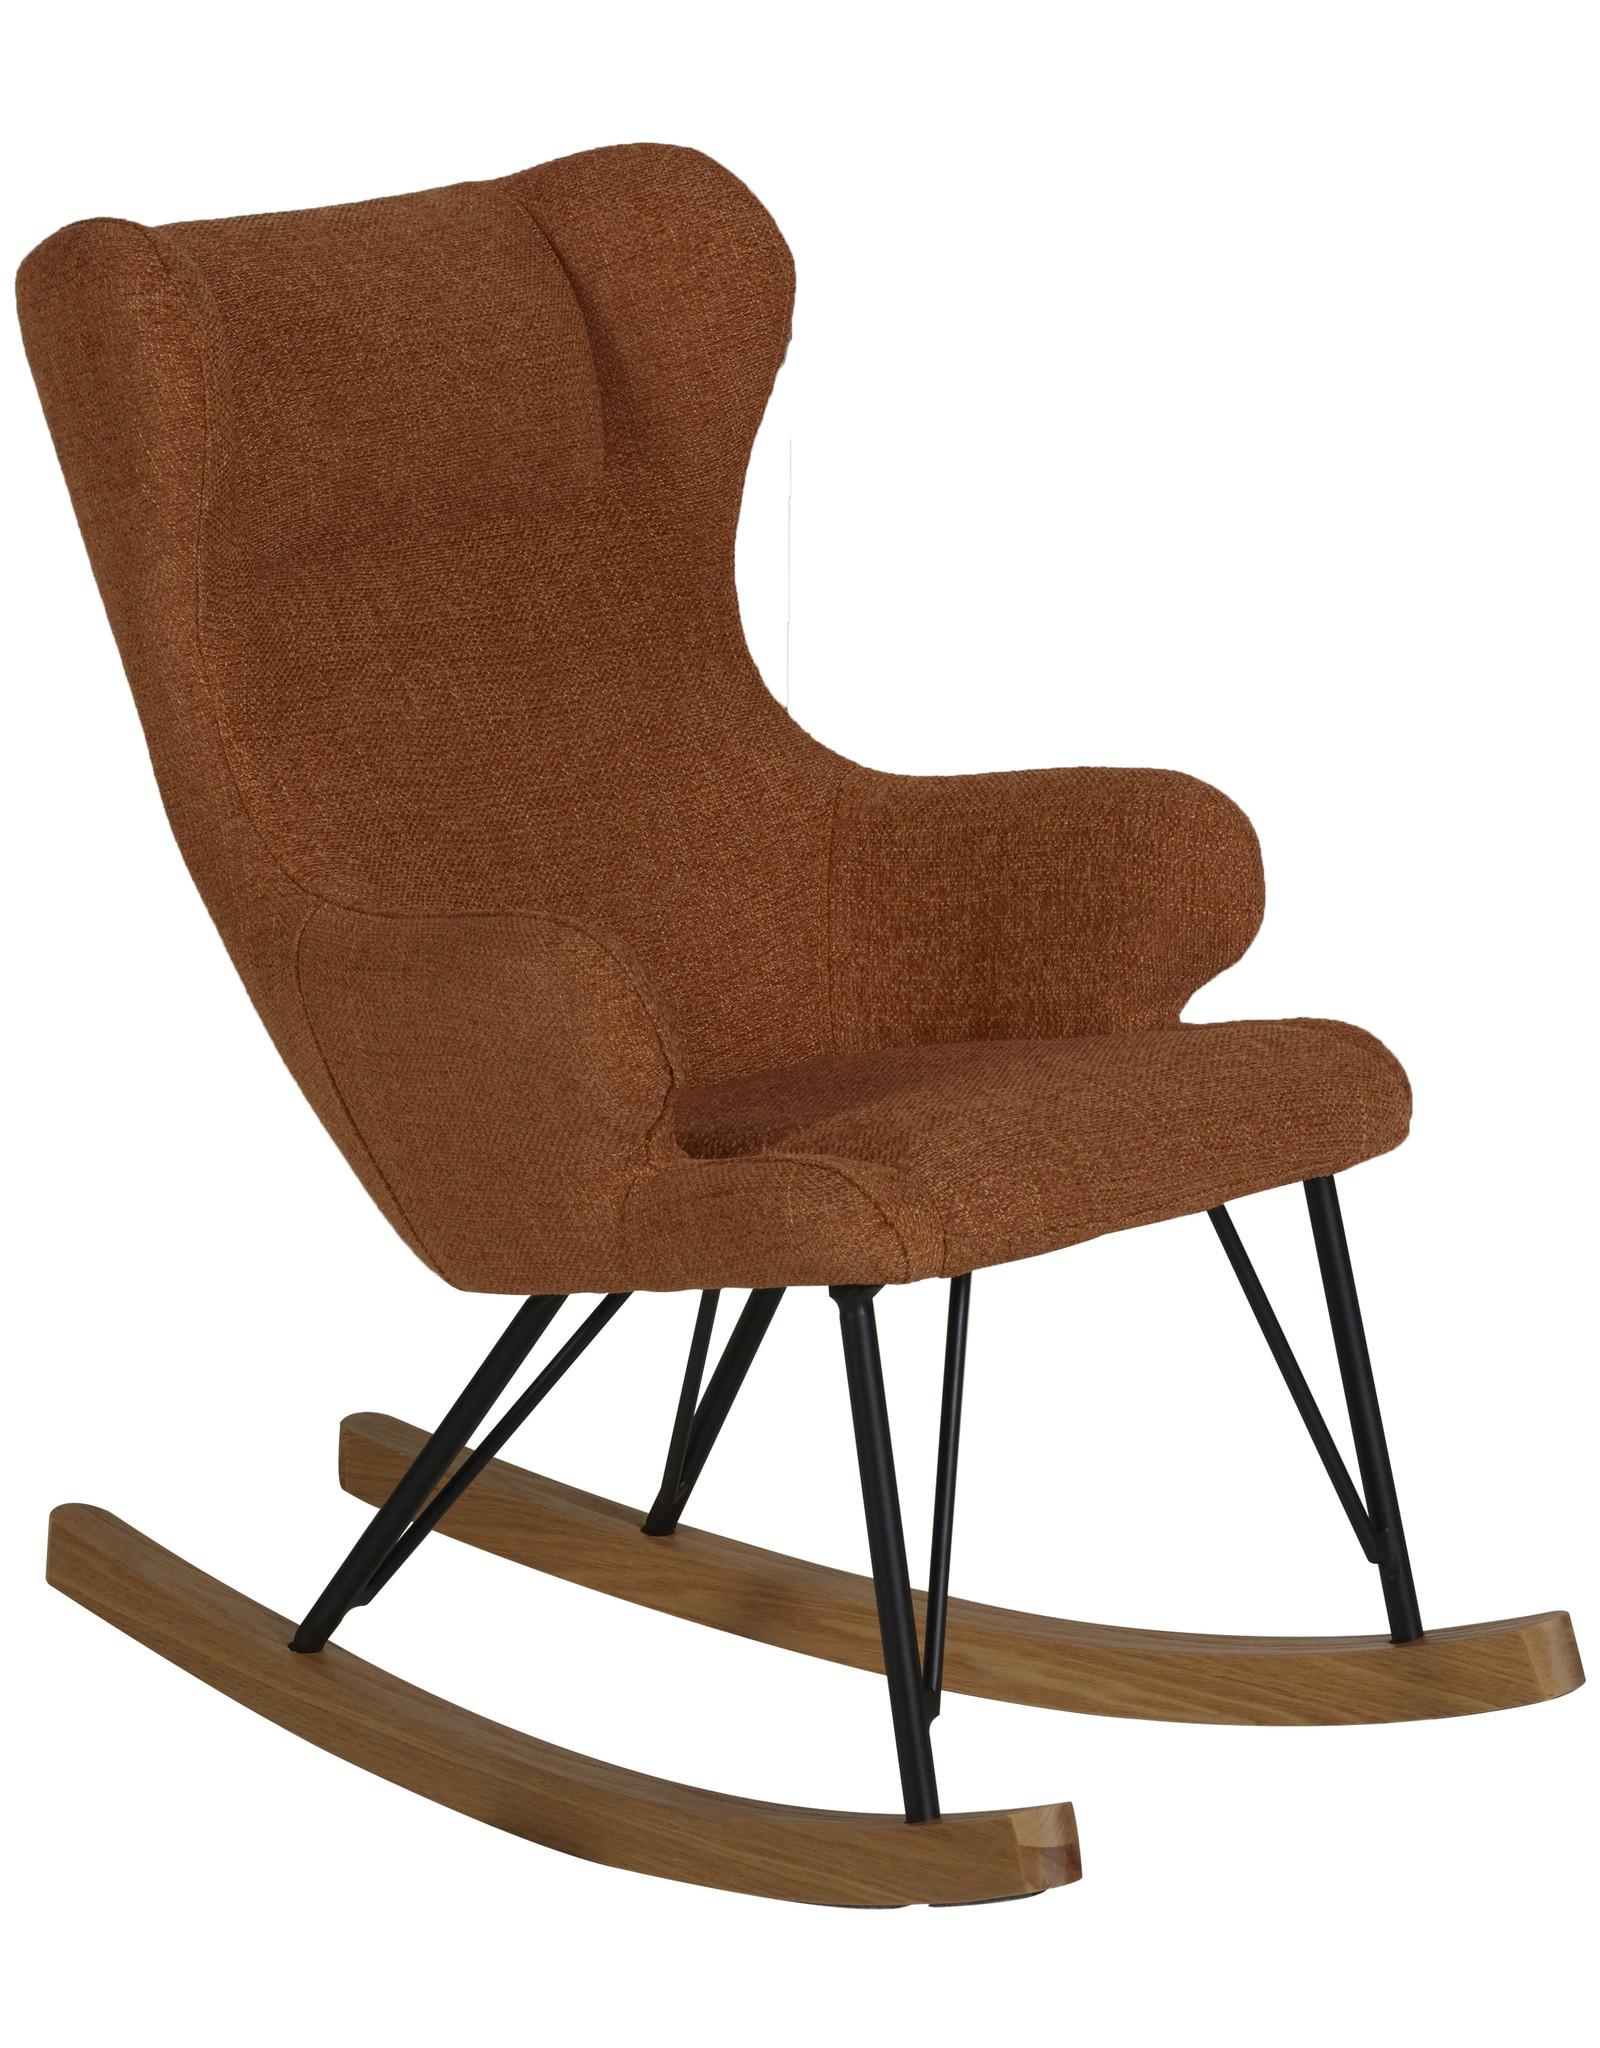 Quax Rocking Kids Chair De Luxe - Terra